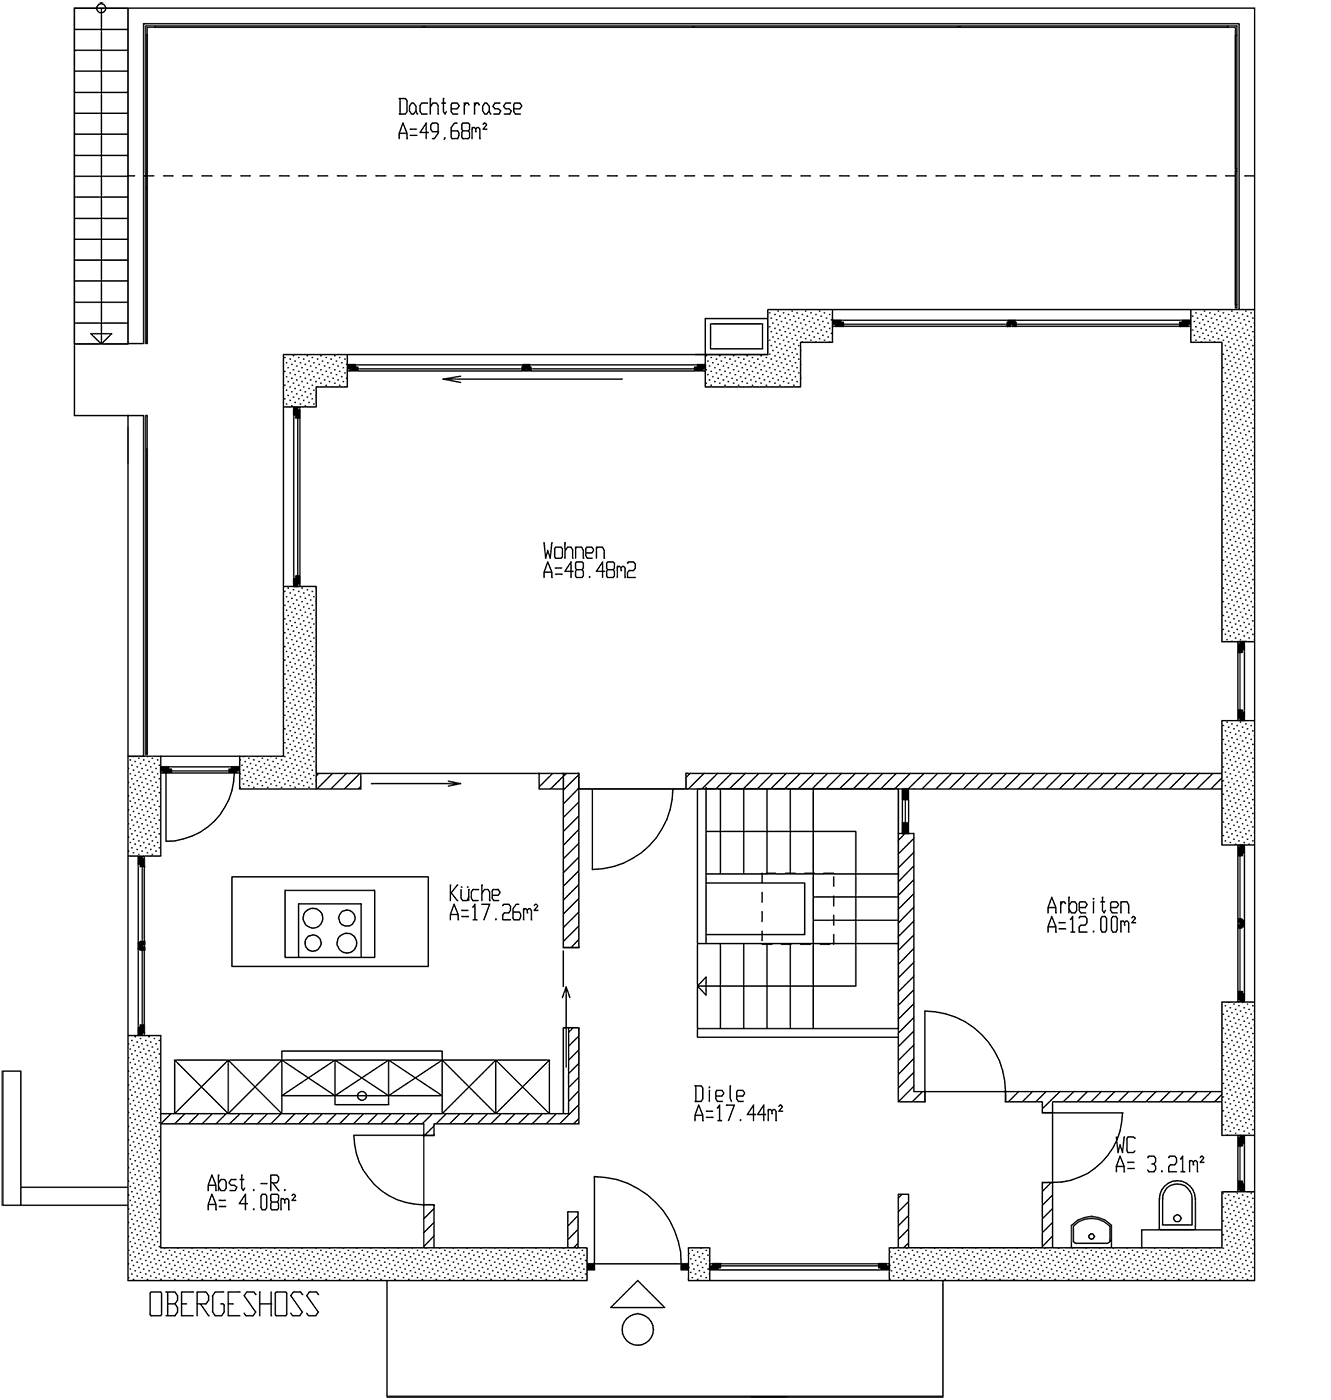 bauhaus-in-hanglage-grundriss-og